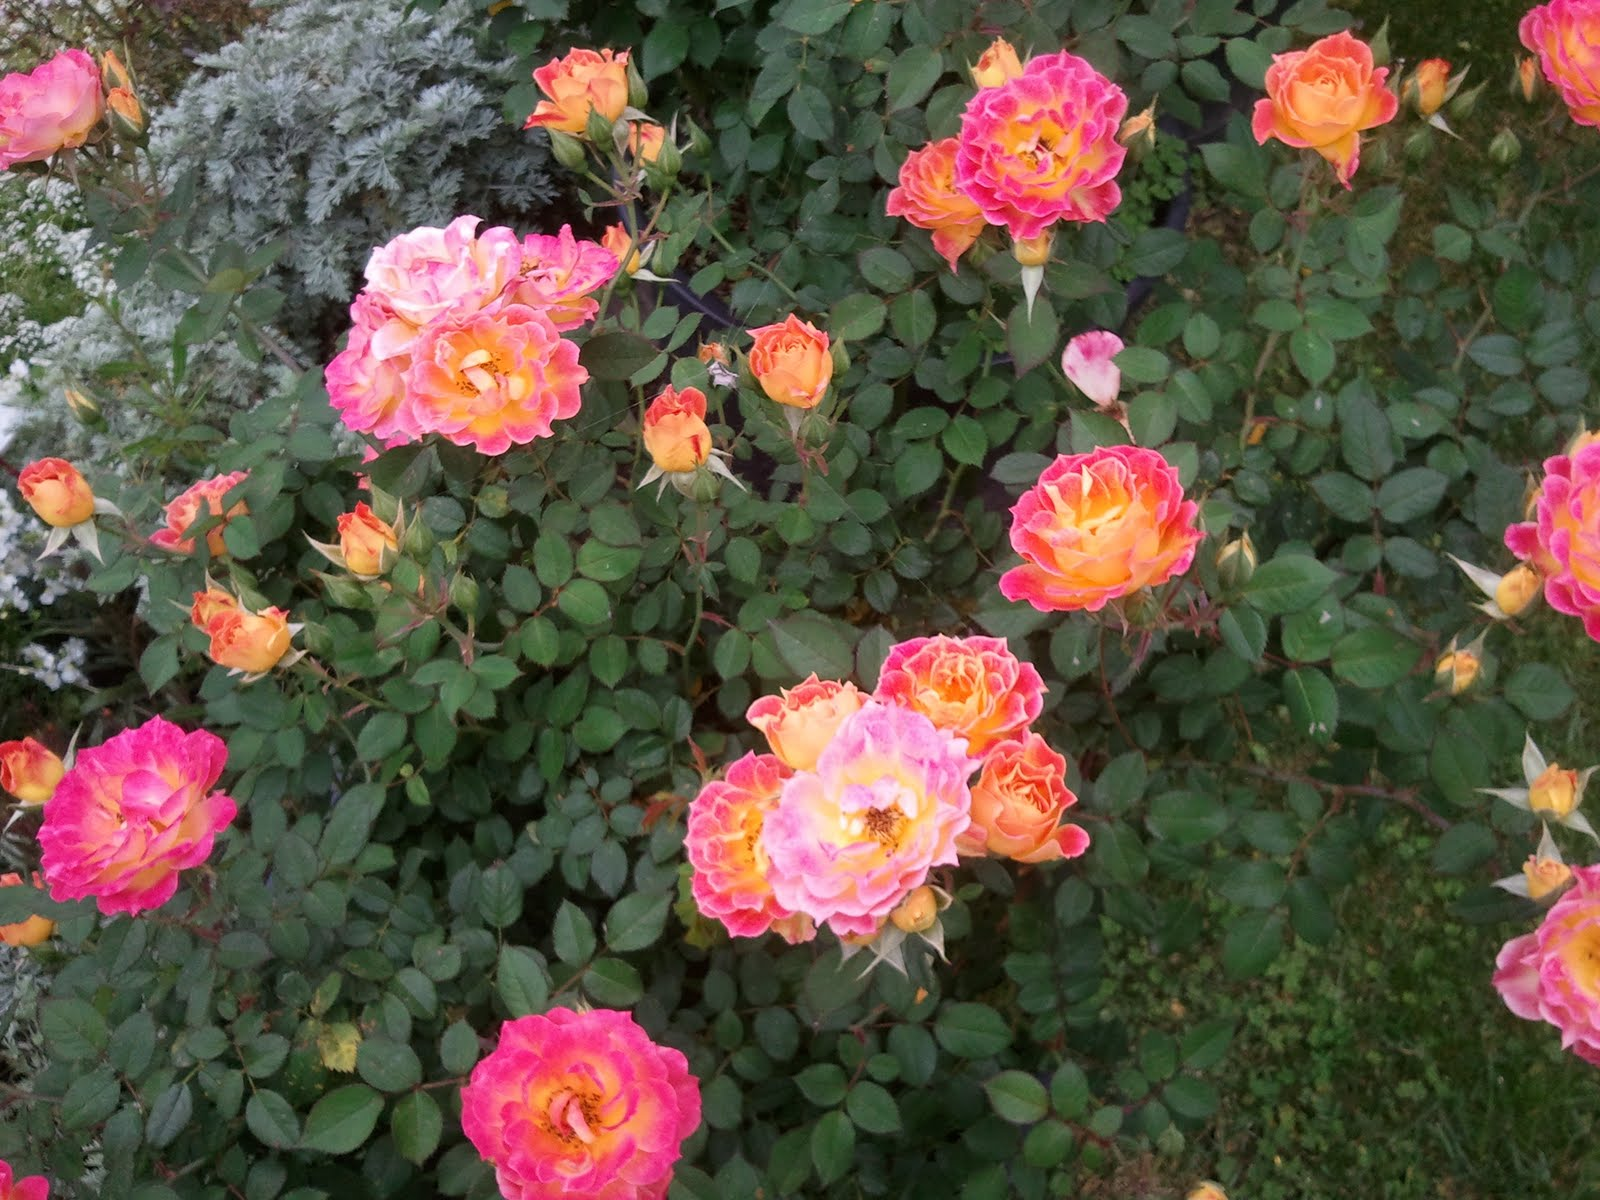 stephs world Tiddly winks miniature rose